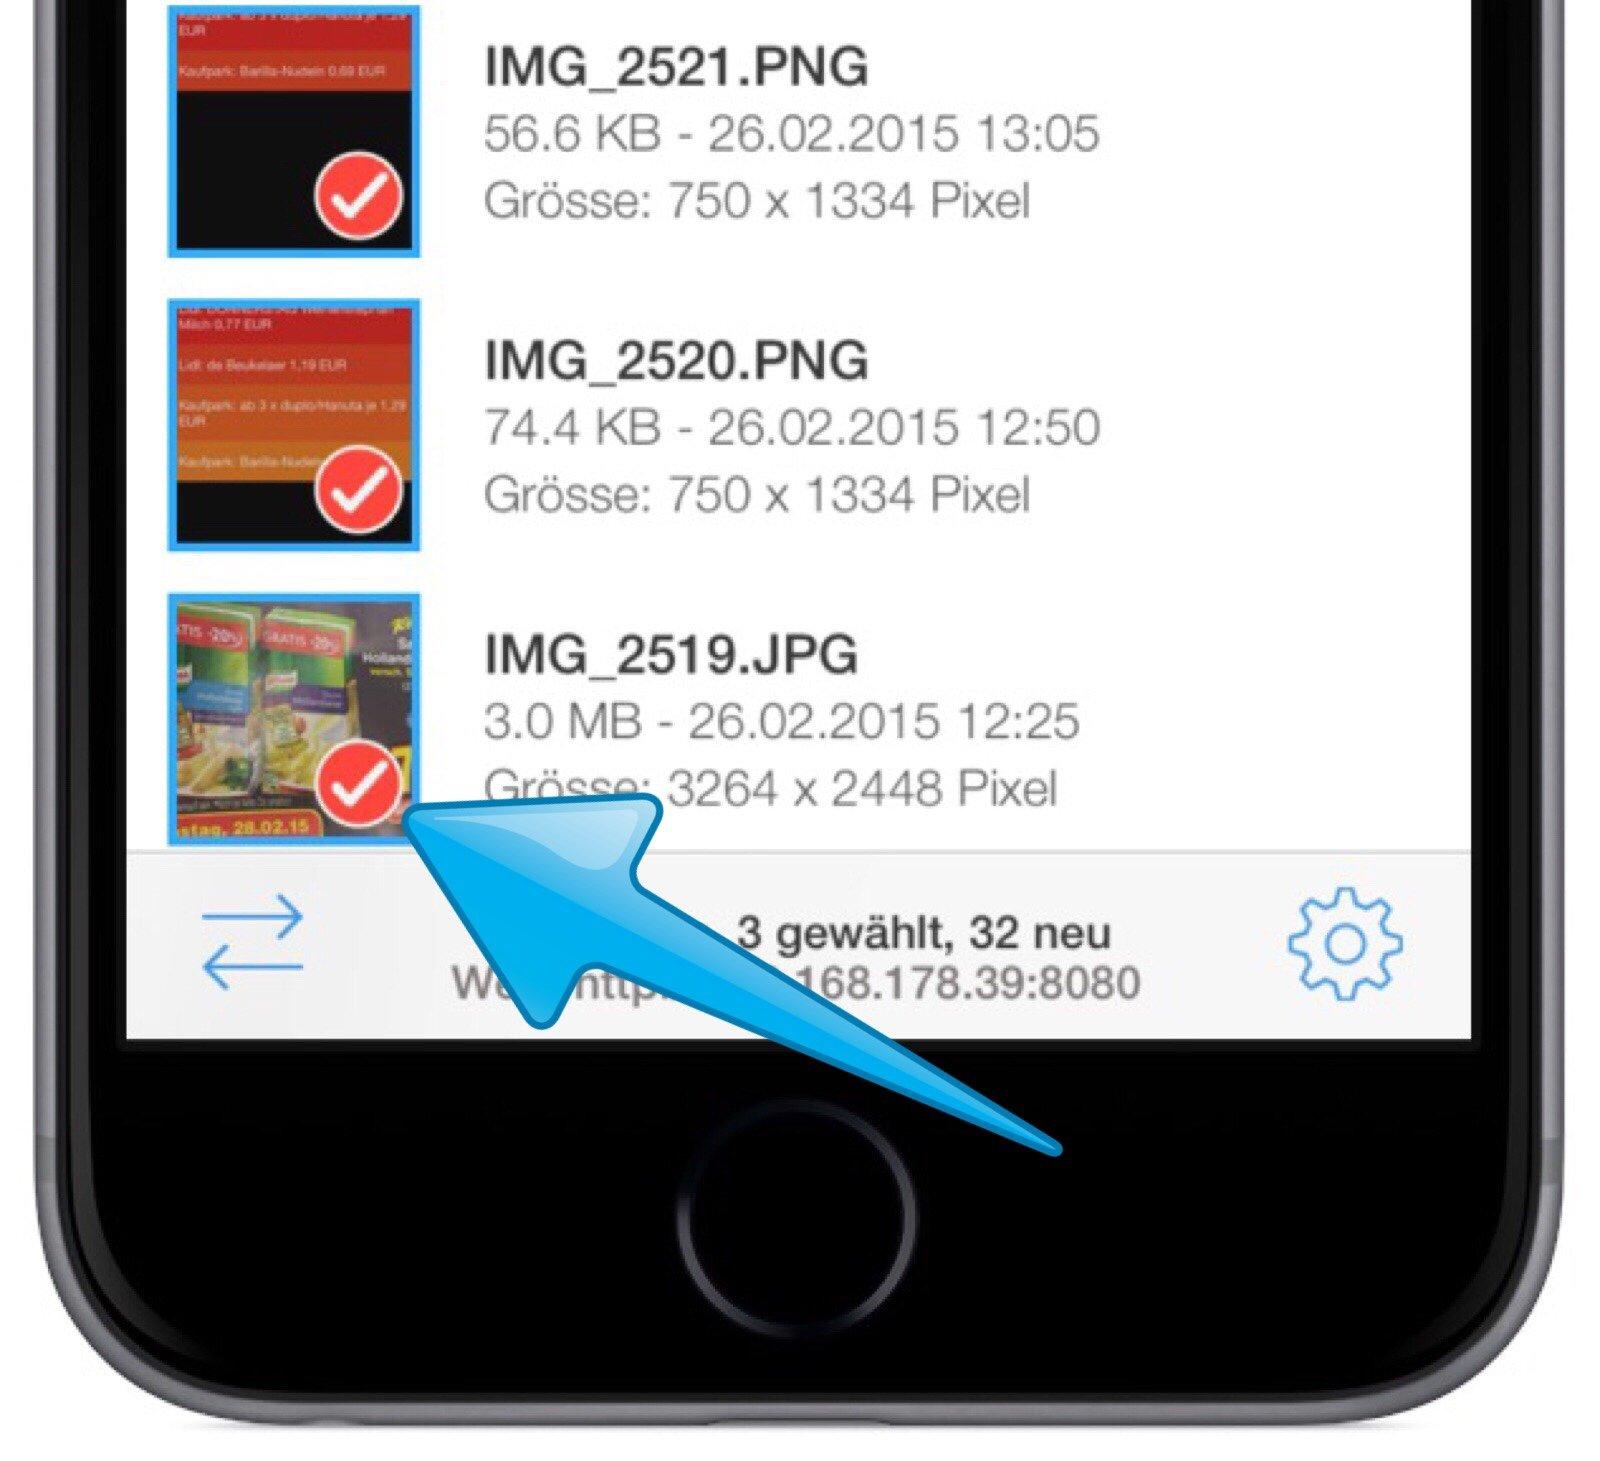 iPhone-iPad-Mac-Windows-PC-Android-Bild-Transfer-übertragen-App-Software-PhotoSync-2.jpg